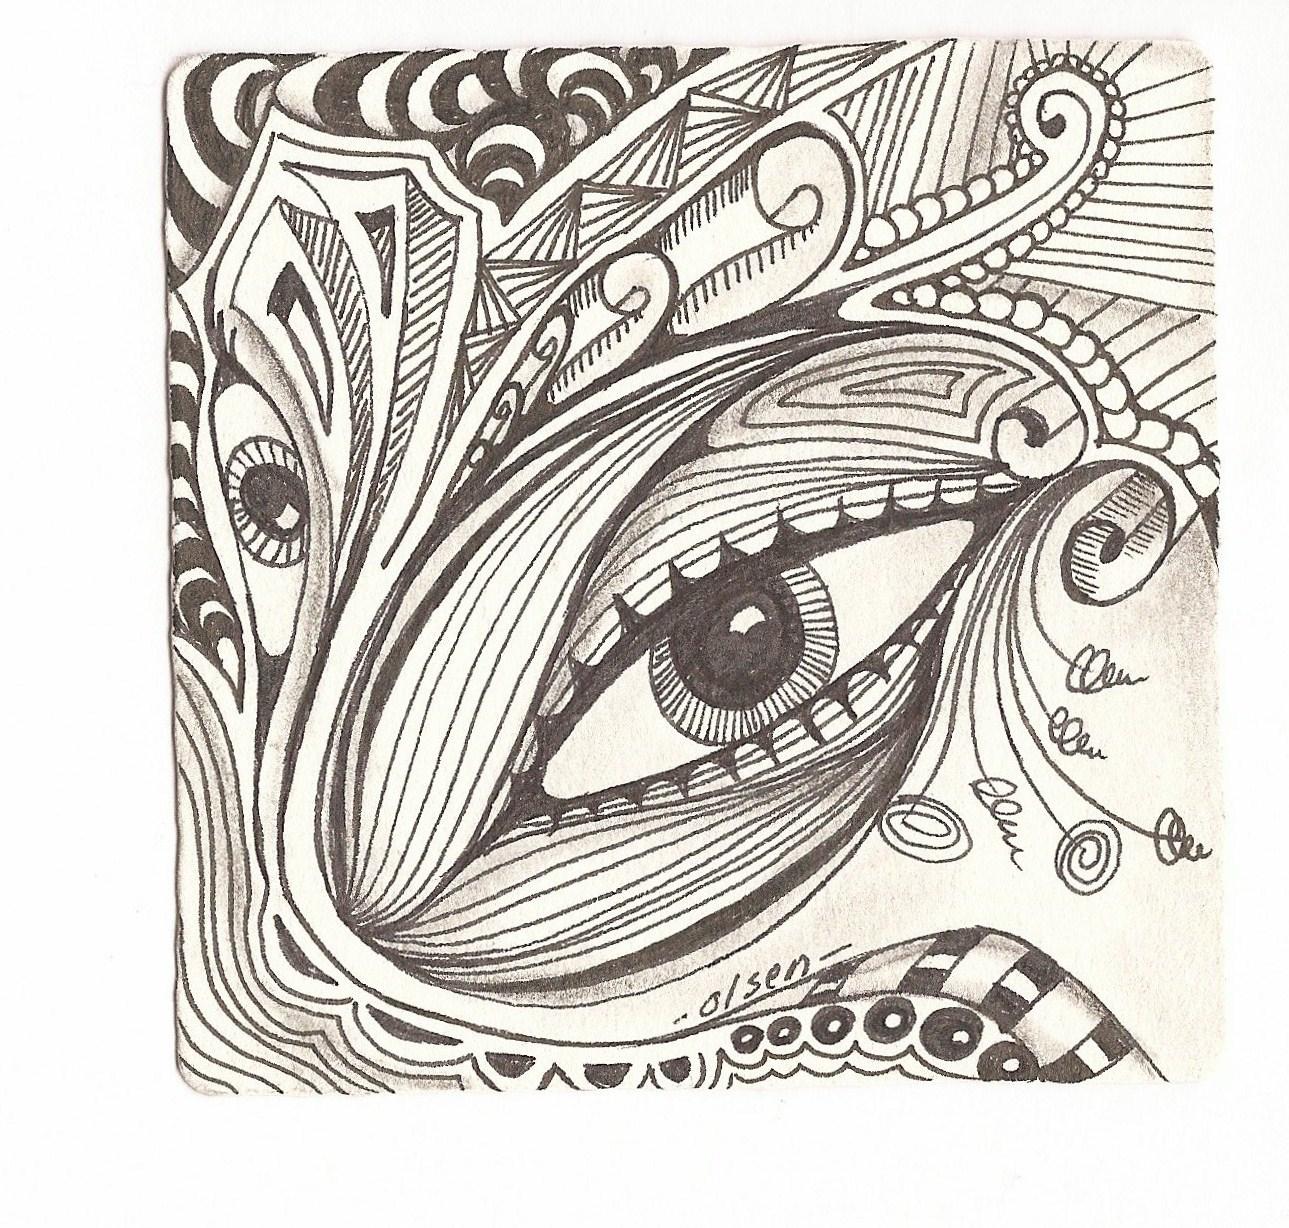 Gallery For gt Easy Zentangle Art